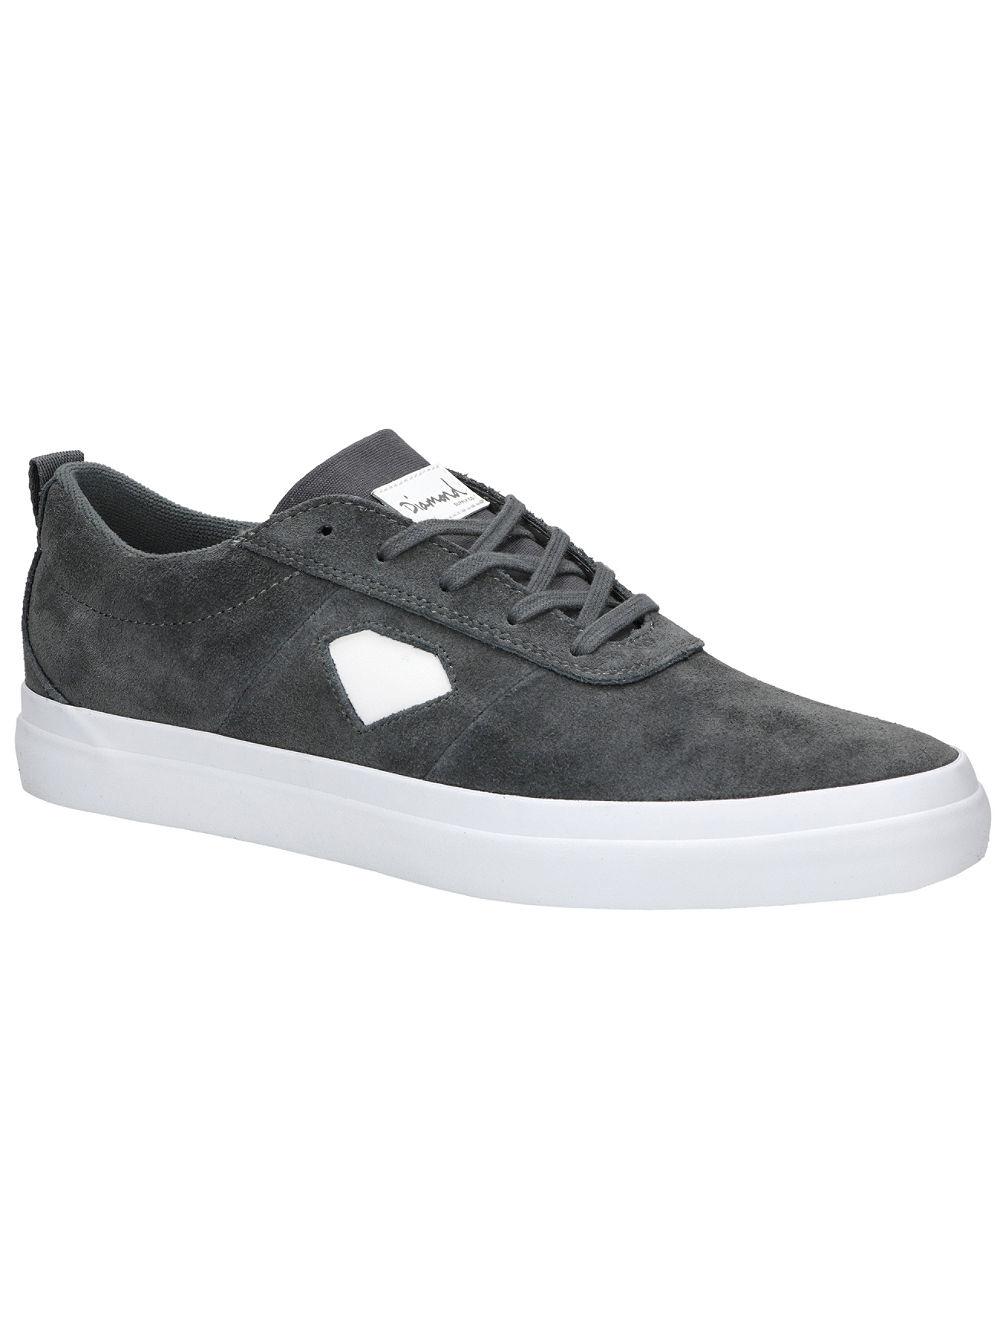 b0d07e10c0 Buy Diamond Icon Skate Shoes online at Blue Tomato